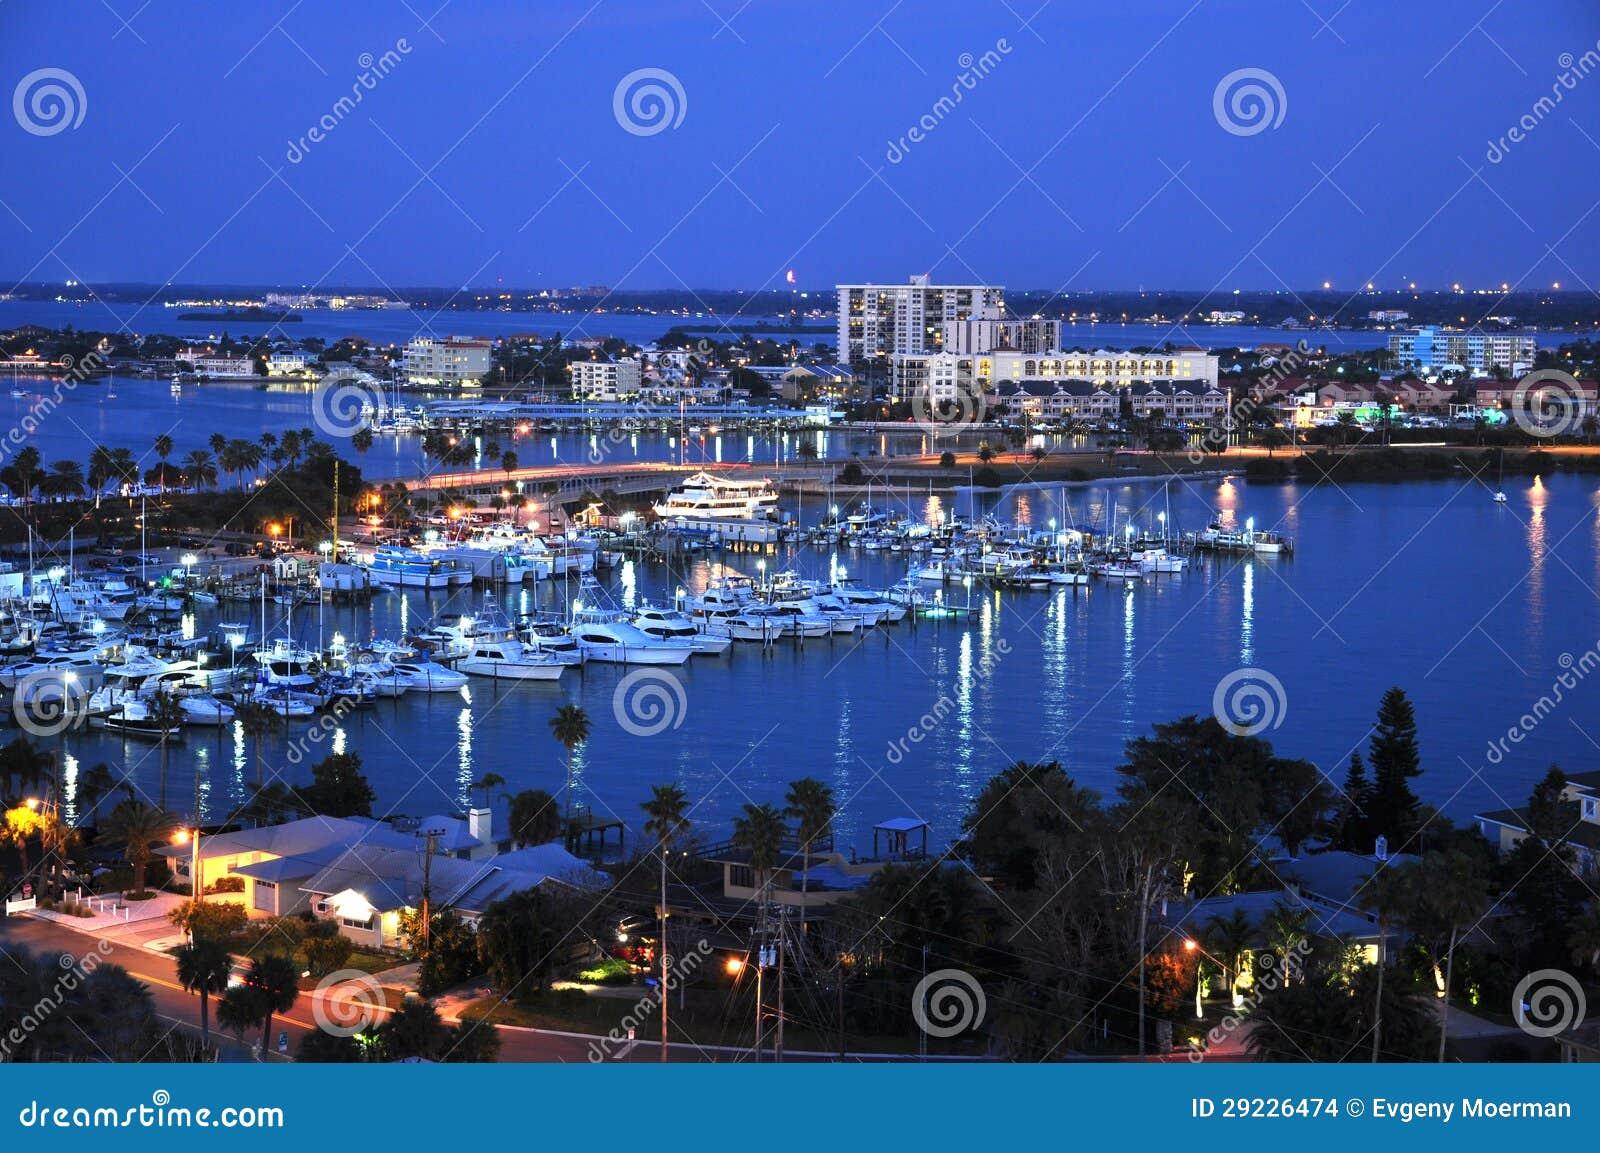 Download Clearwater Florida foto de stock. Imagem de azul, florida - 29226474